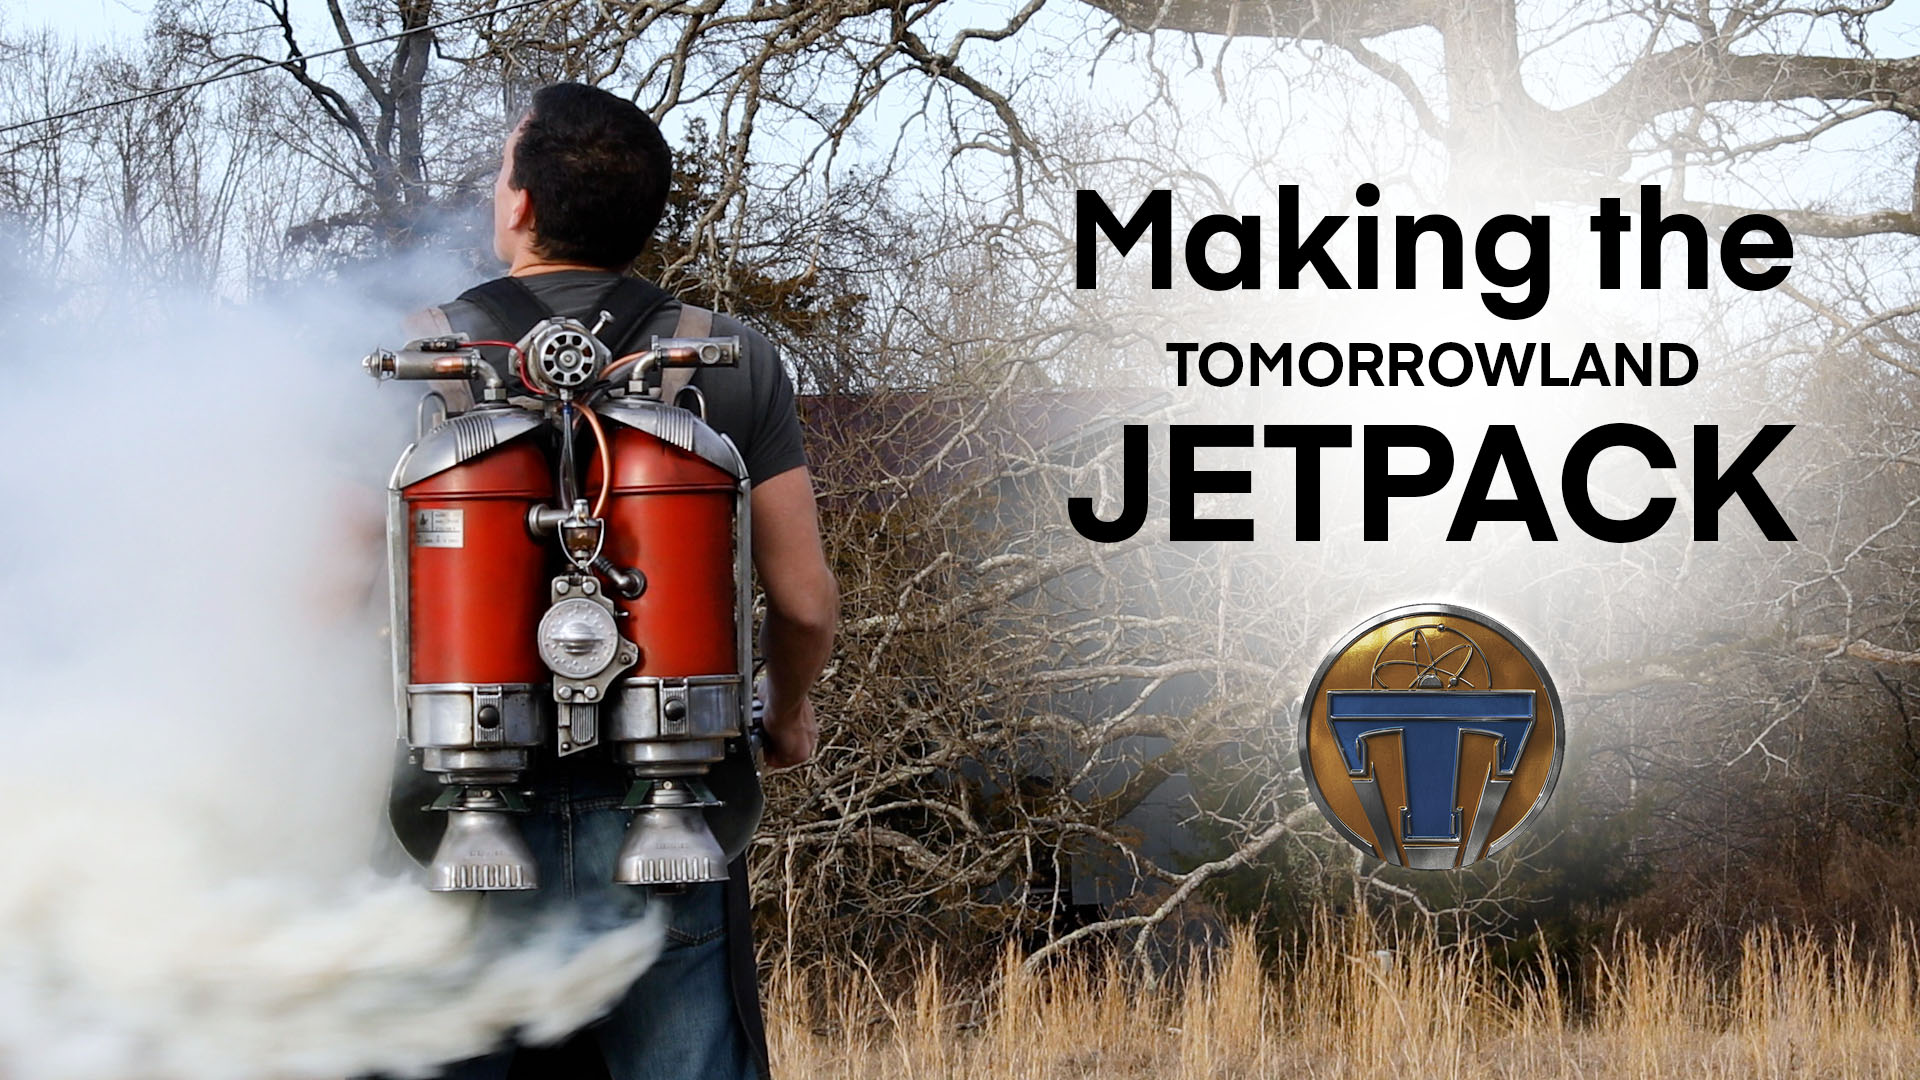 Jetpack Thmbnail 5.jpg